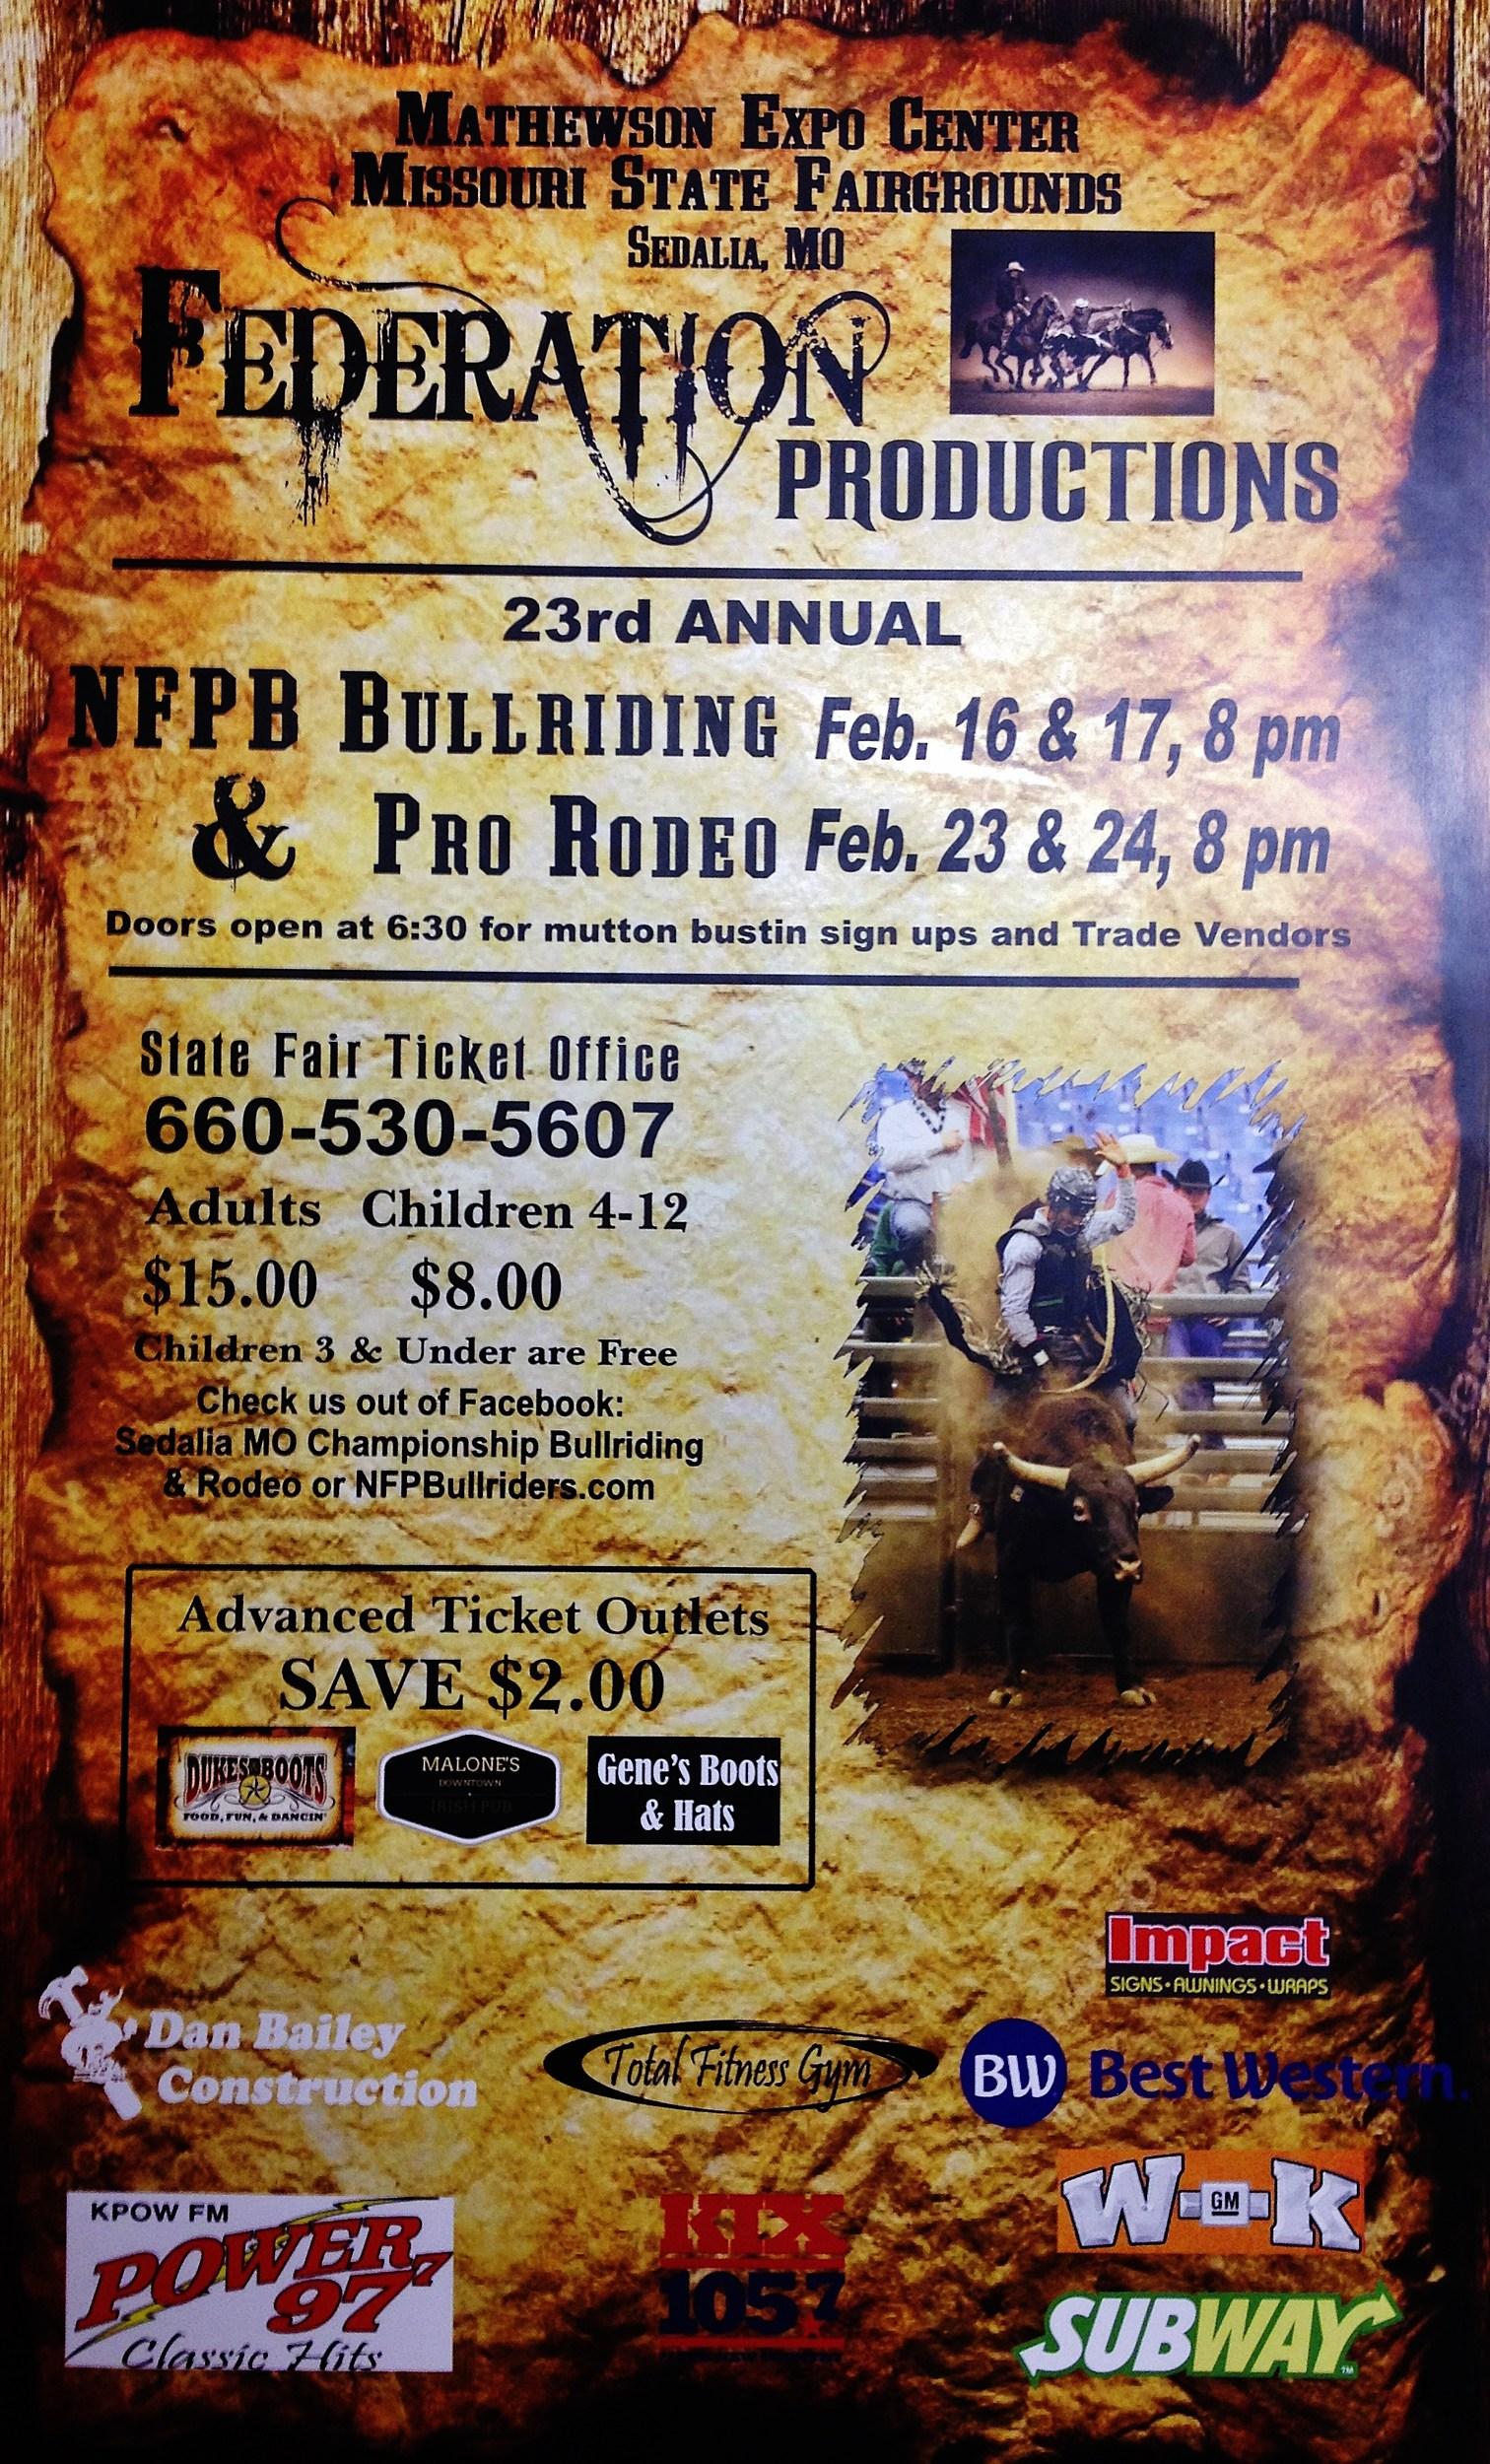 Bullriding Amp Pro Rodeo Coming To Missouri State Fairgrounds